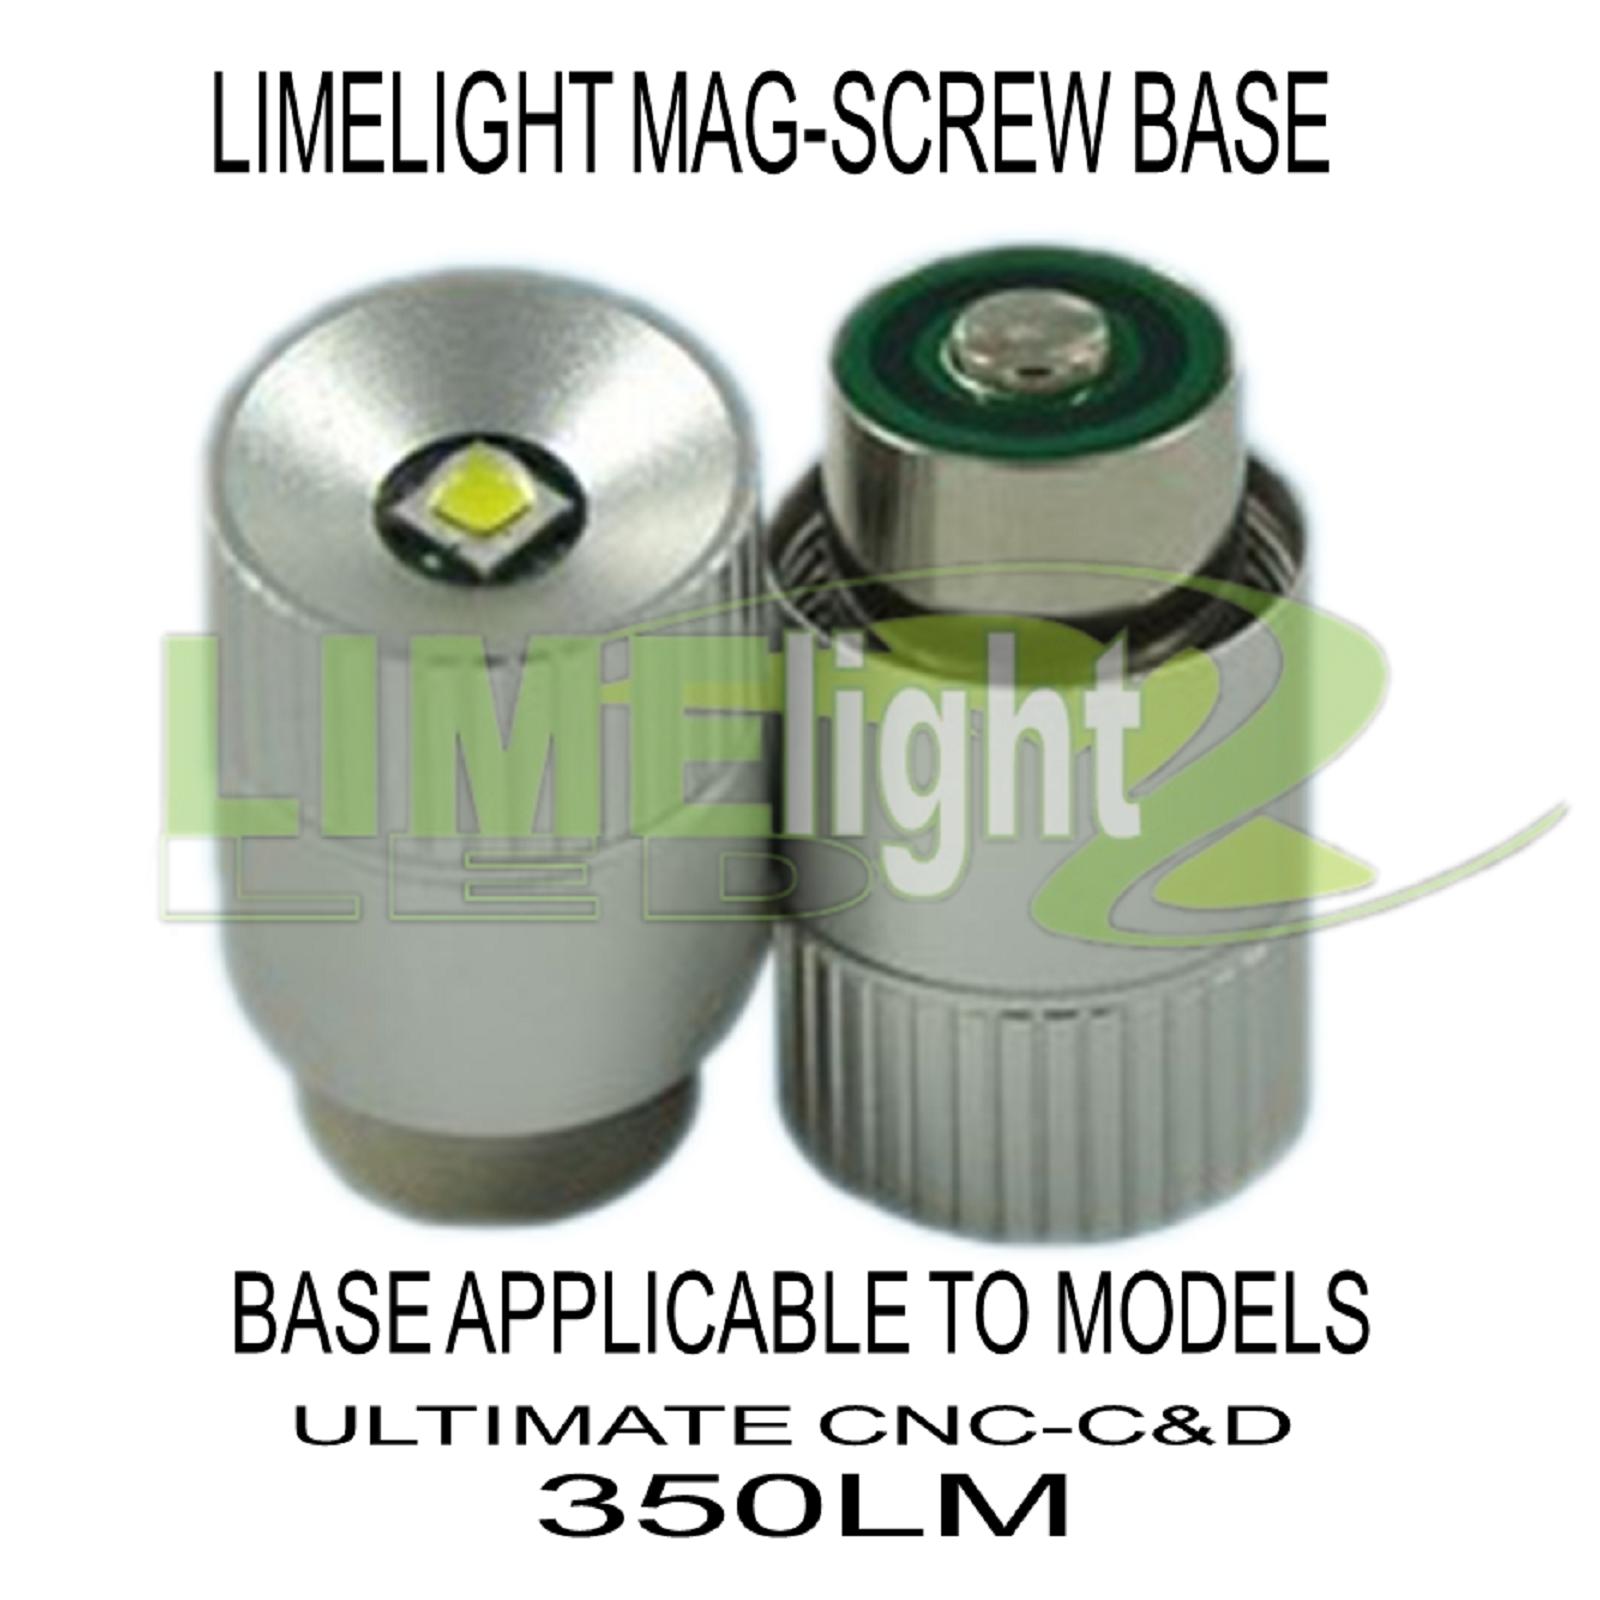 Maglite Led Upgrade Conversion Cree 1W-10W Bulb Globe Flashlight Torch 90-1100Lm 4